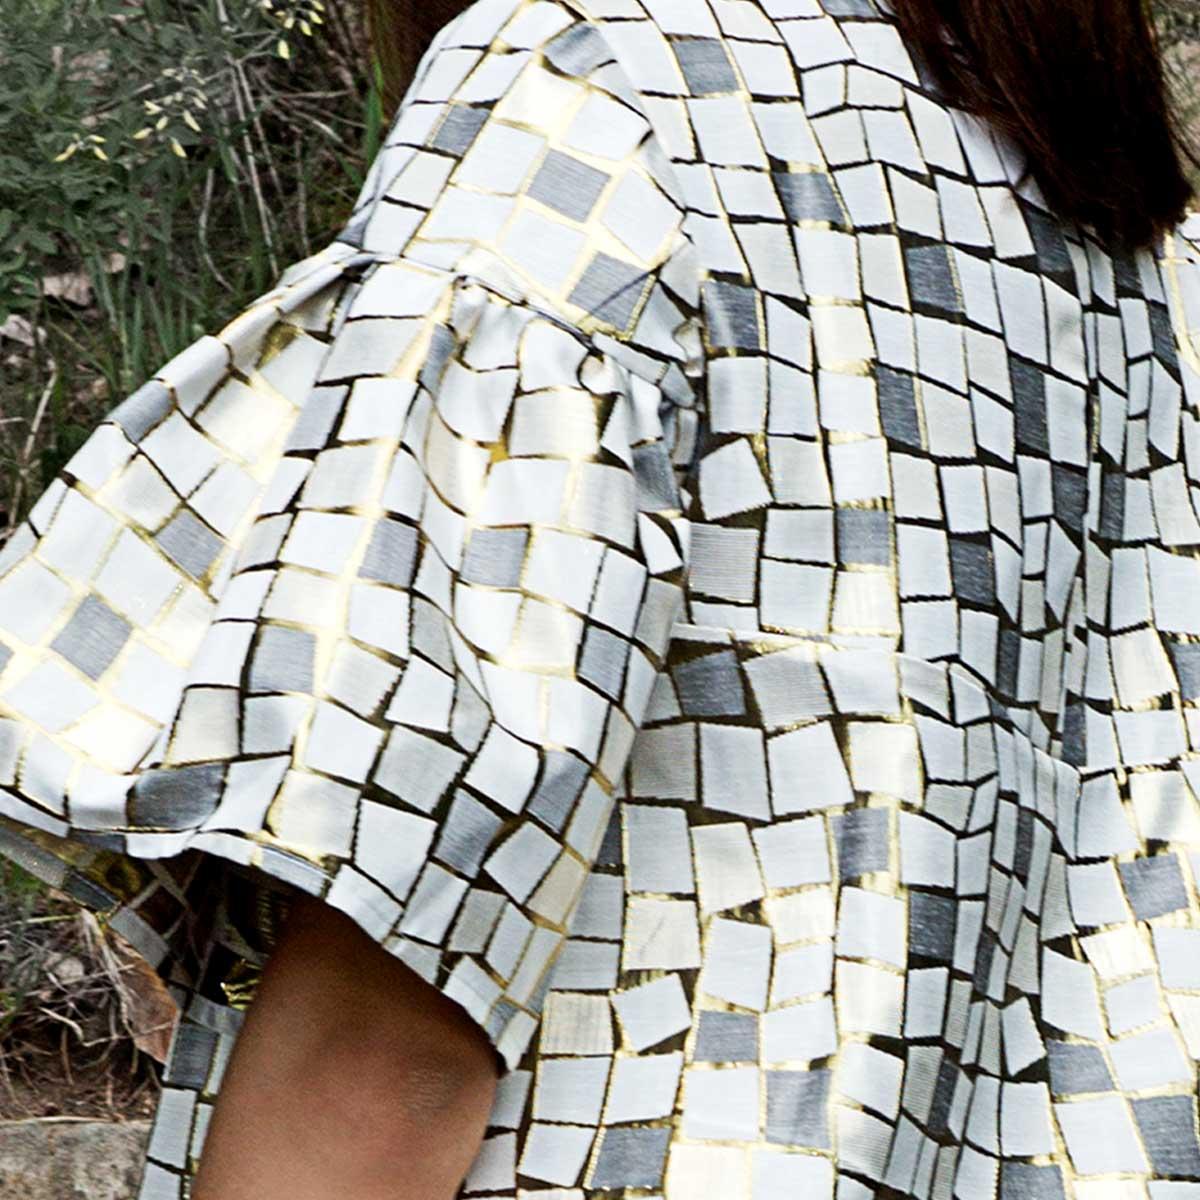 Twiggy dress. Short dress. Designed for loose fit. Non-stretchy fabric. Gudnitz Copenhagen